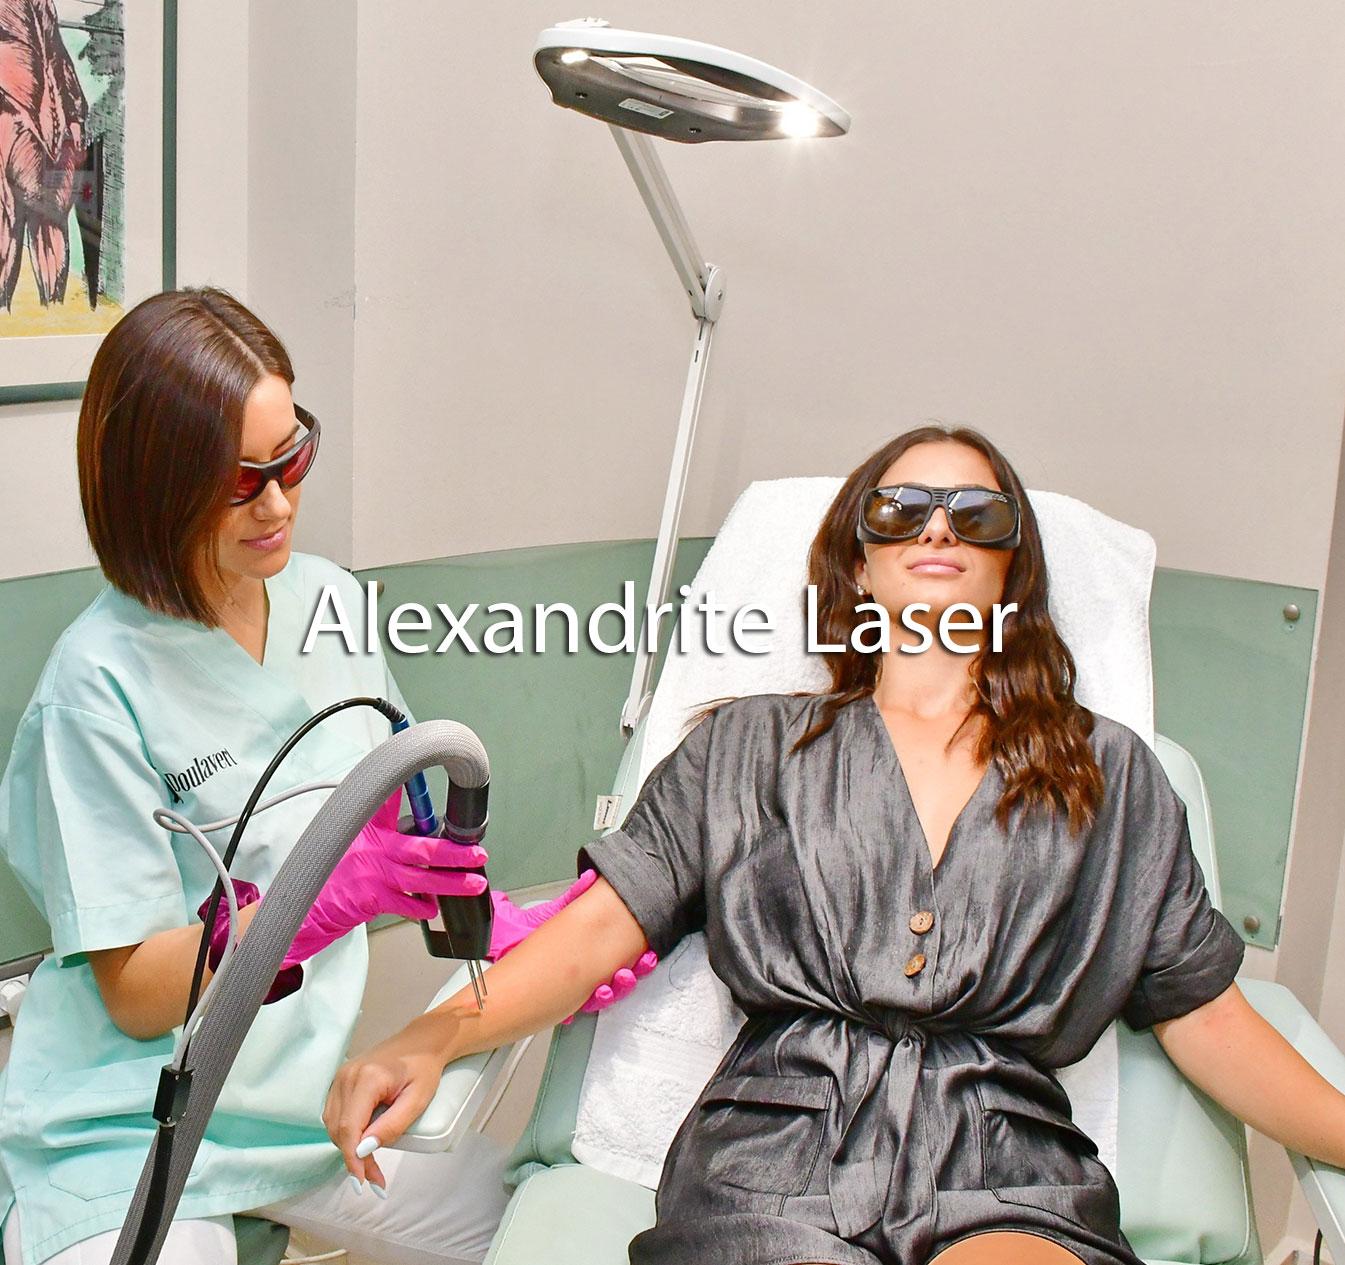 Alexandrite-Laser